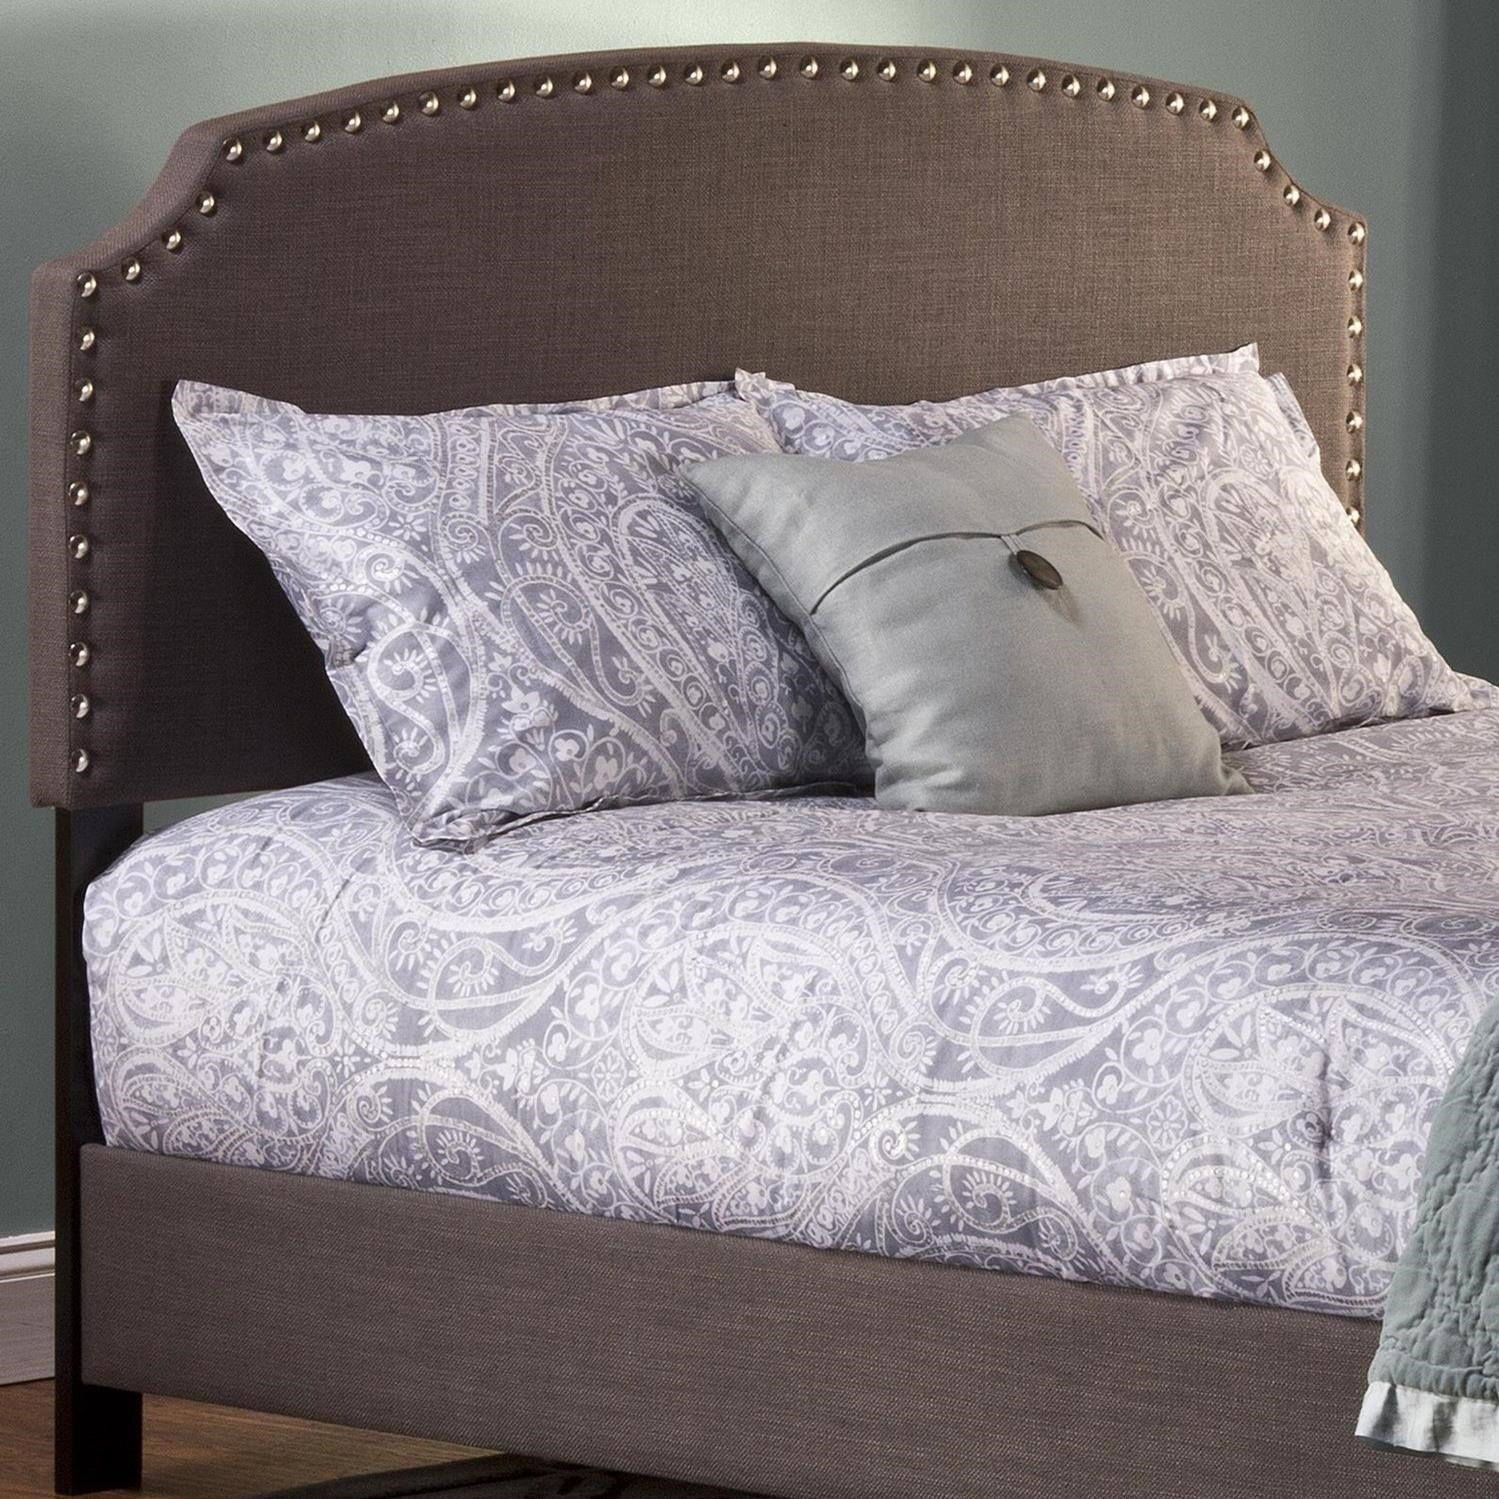 Upholstered Beds King Lani Headboard at Ruby Gordon Home